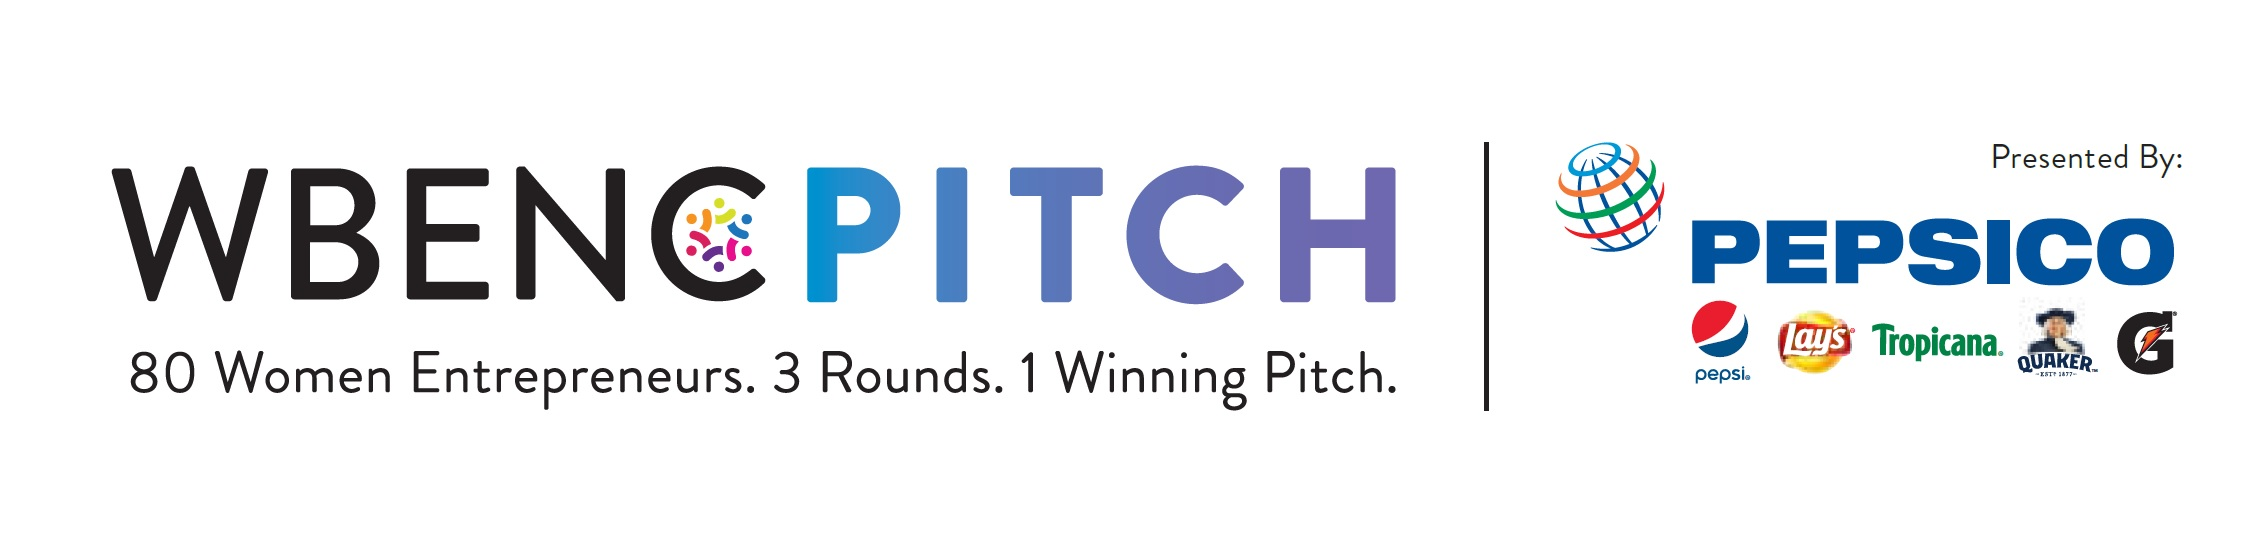 NCBF WBENCPitch Logo.jpg